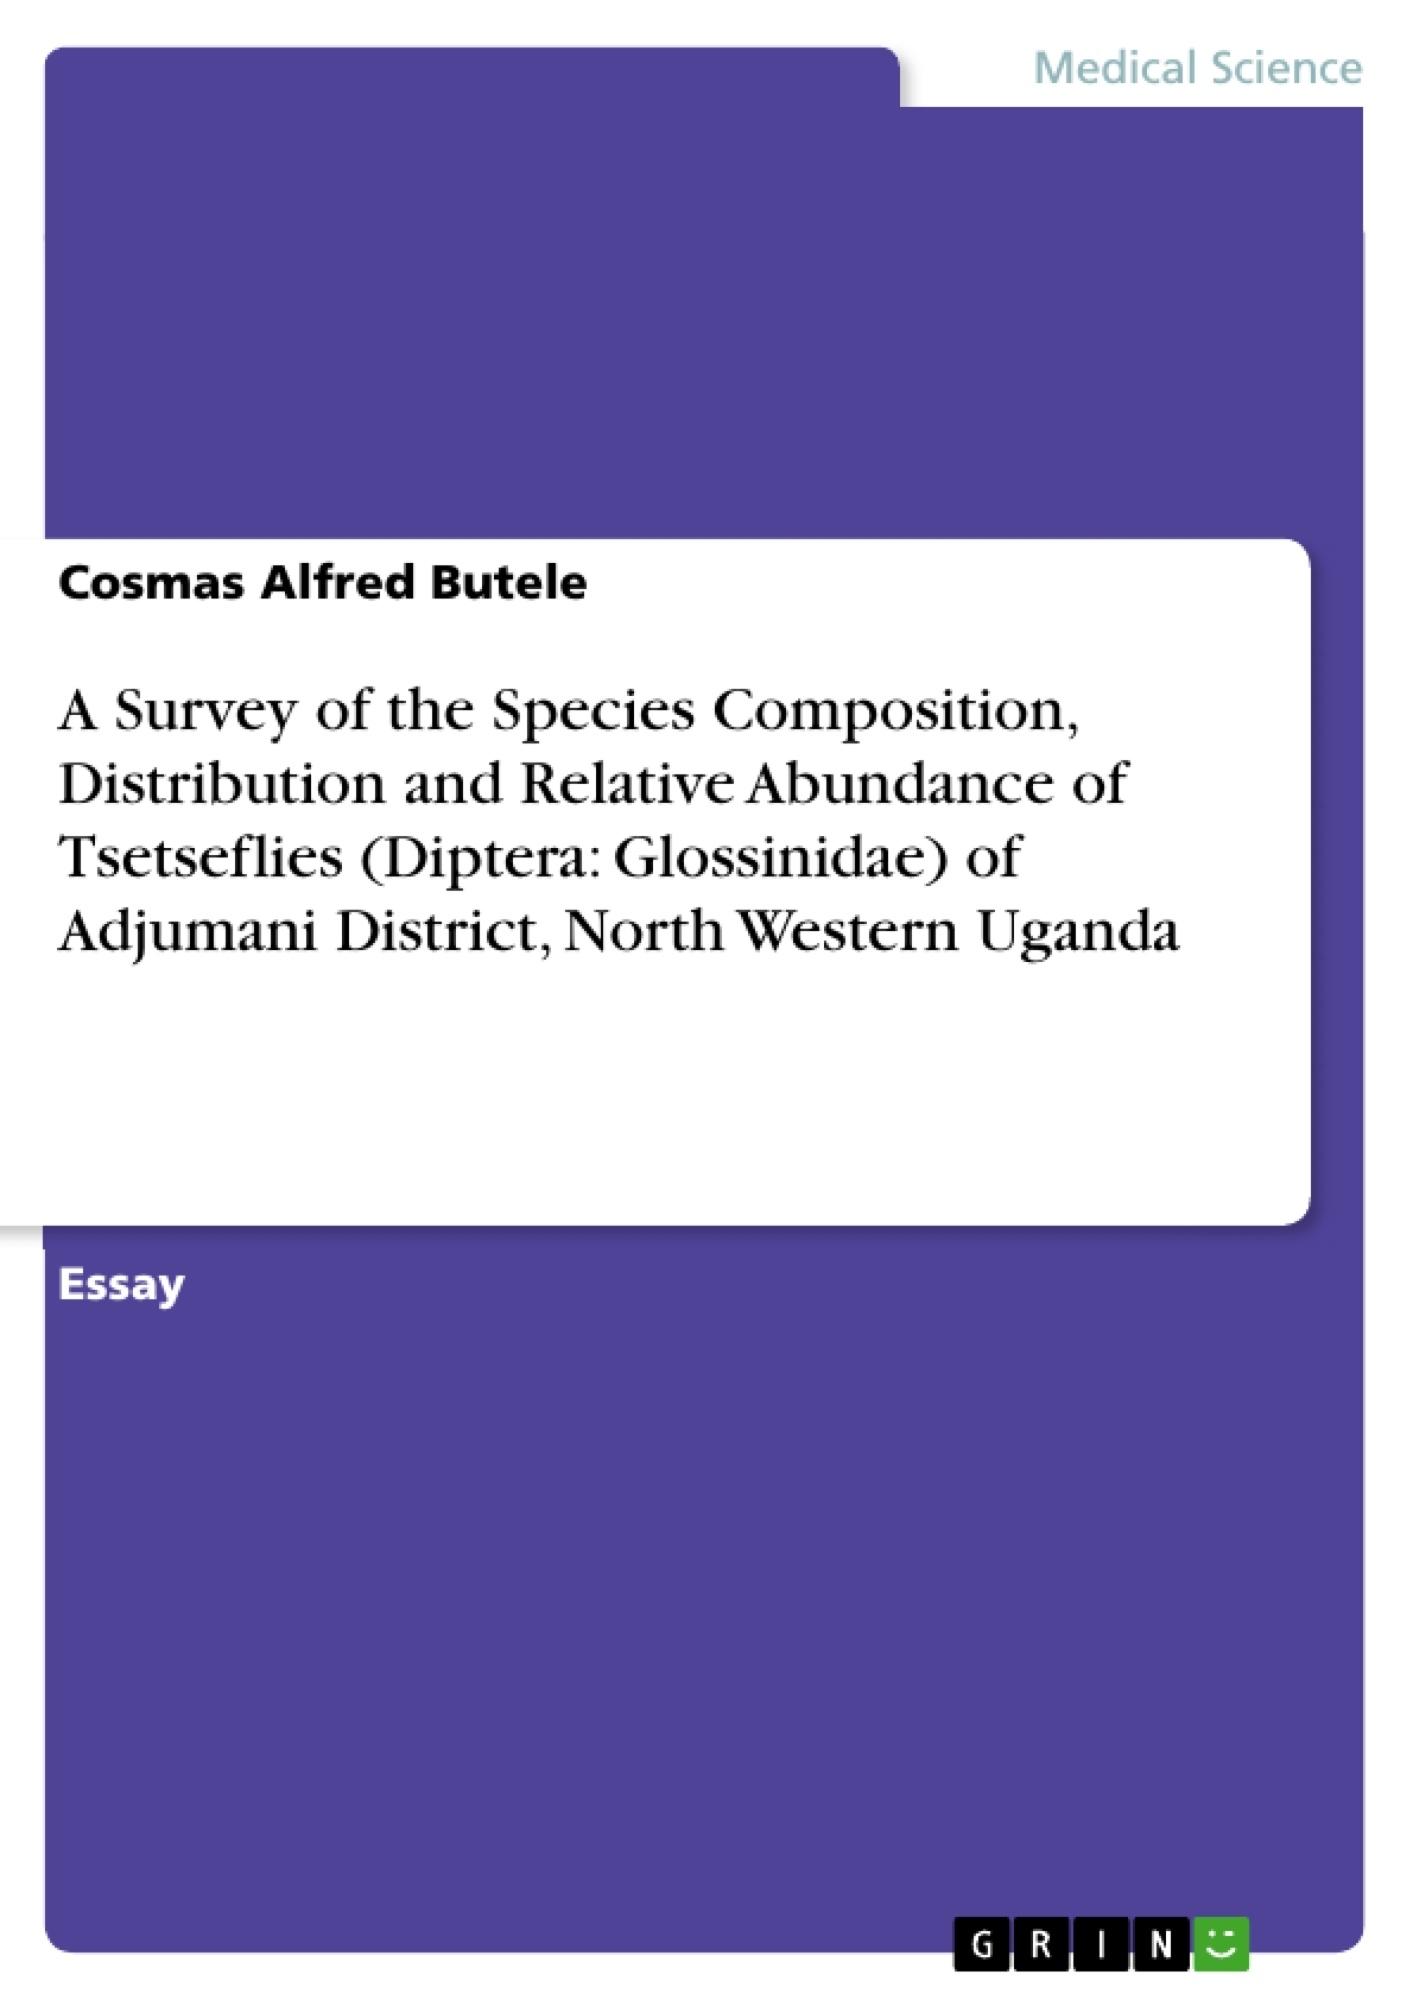 Title: A Survey of the Species Composition, Distribution and Relative Abundance of Tsetseflies (Diptera: Glossinidae) of Adjumani District, North Western Uganda